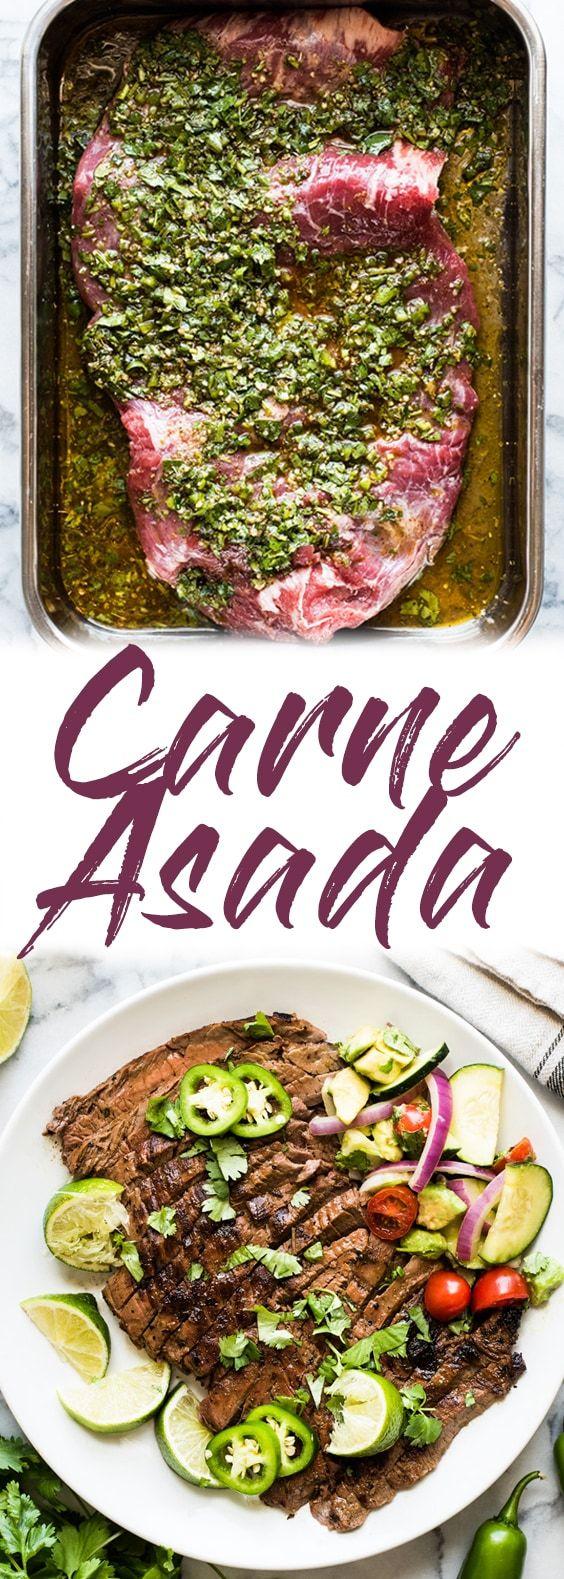 Carne Asada Recipe {Juicy and Flavorful!} - Isabel Eats